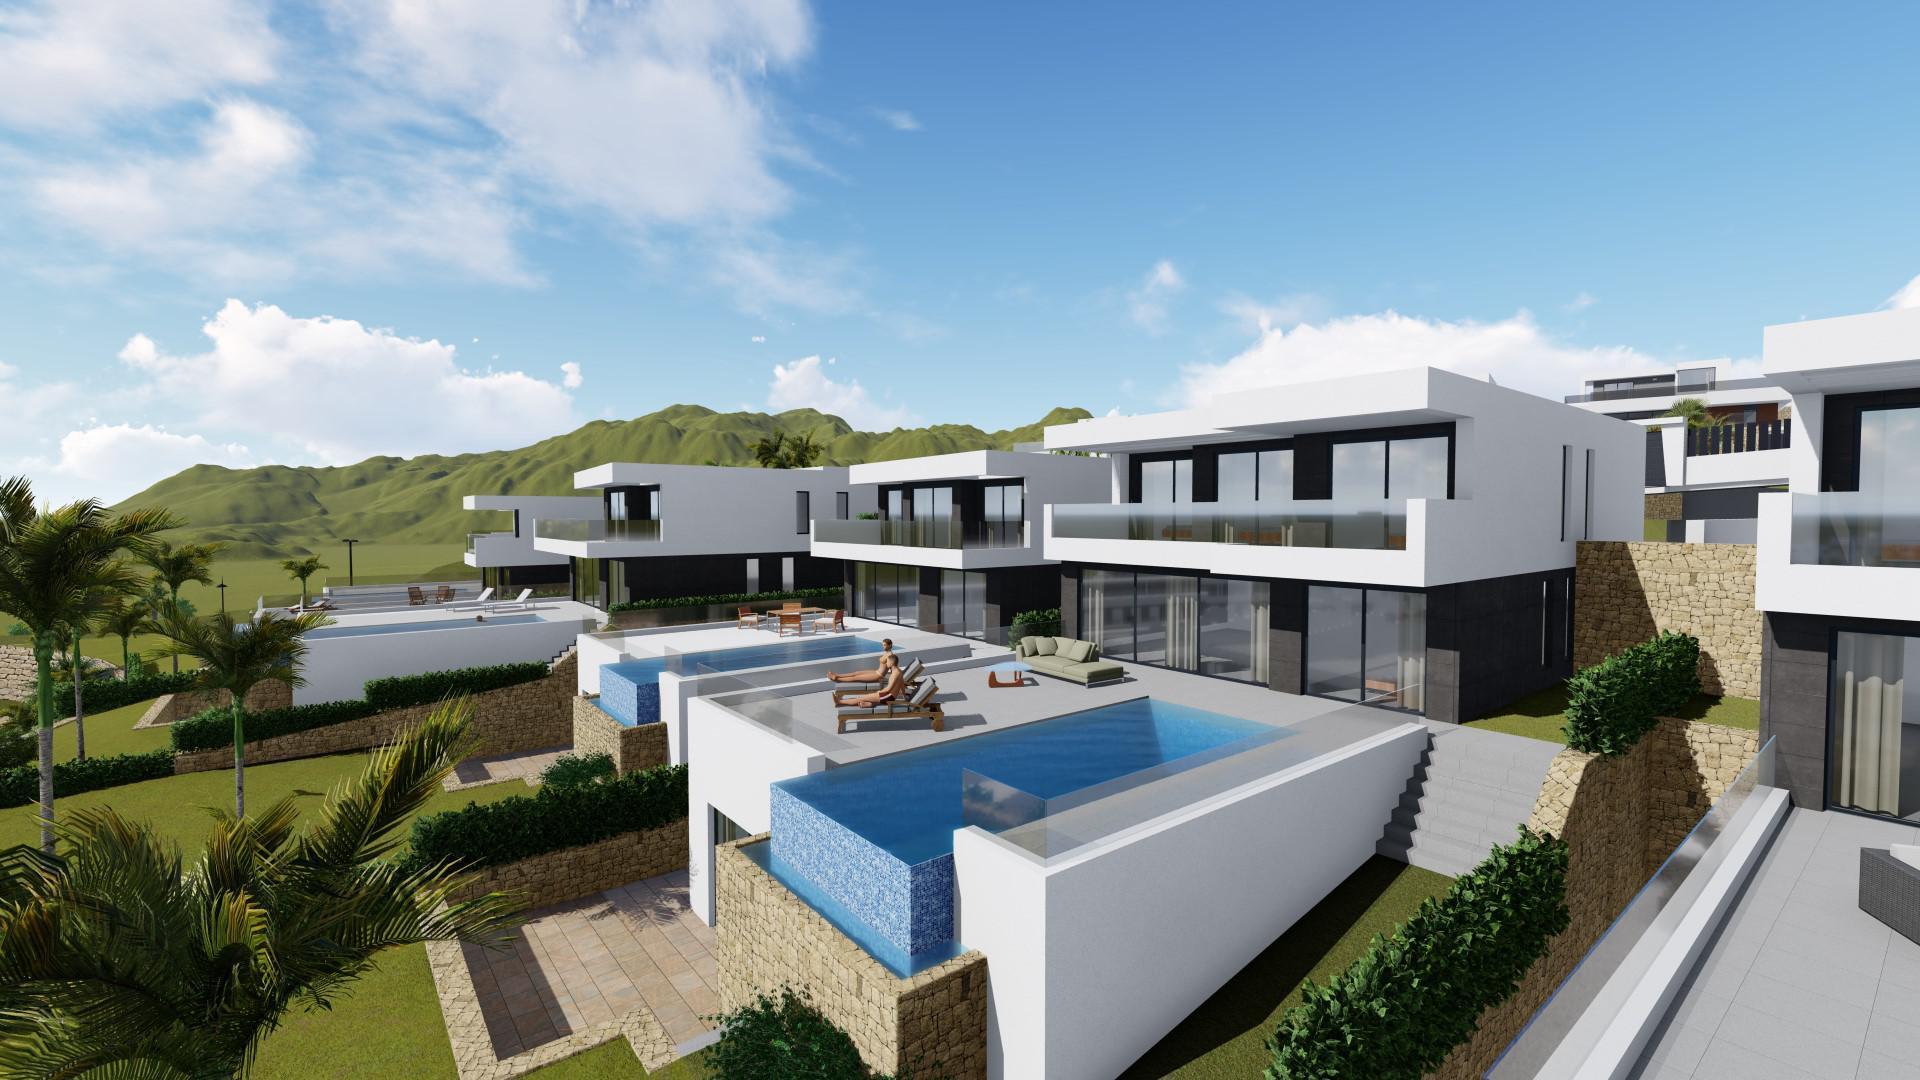 villa en benidorm ·  580000€